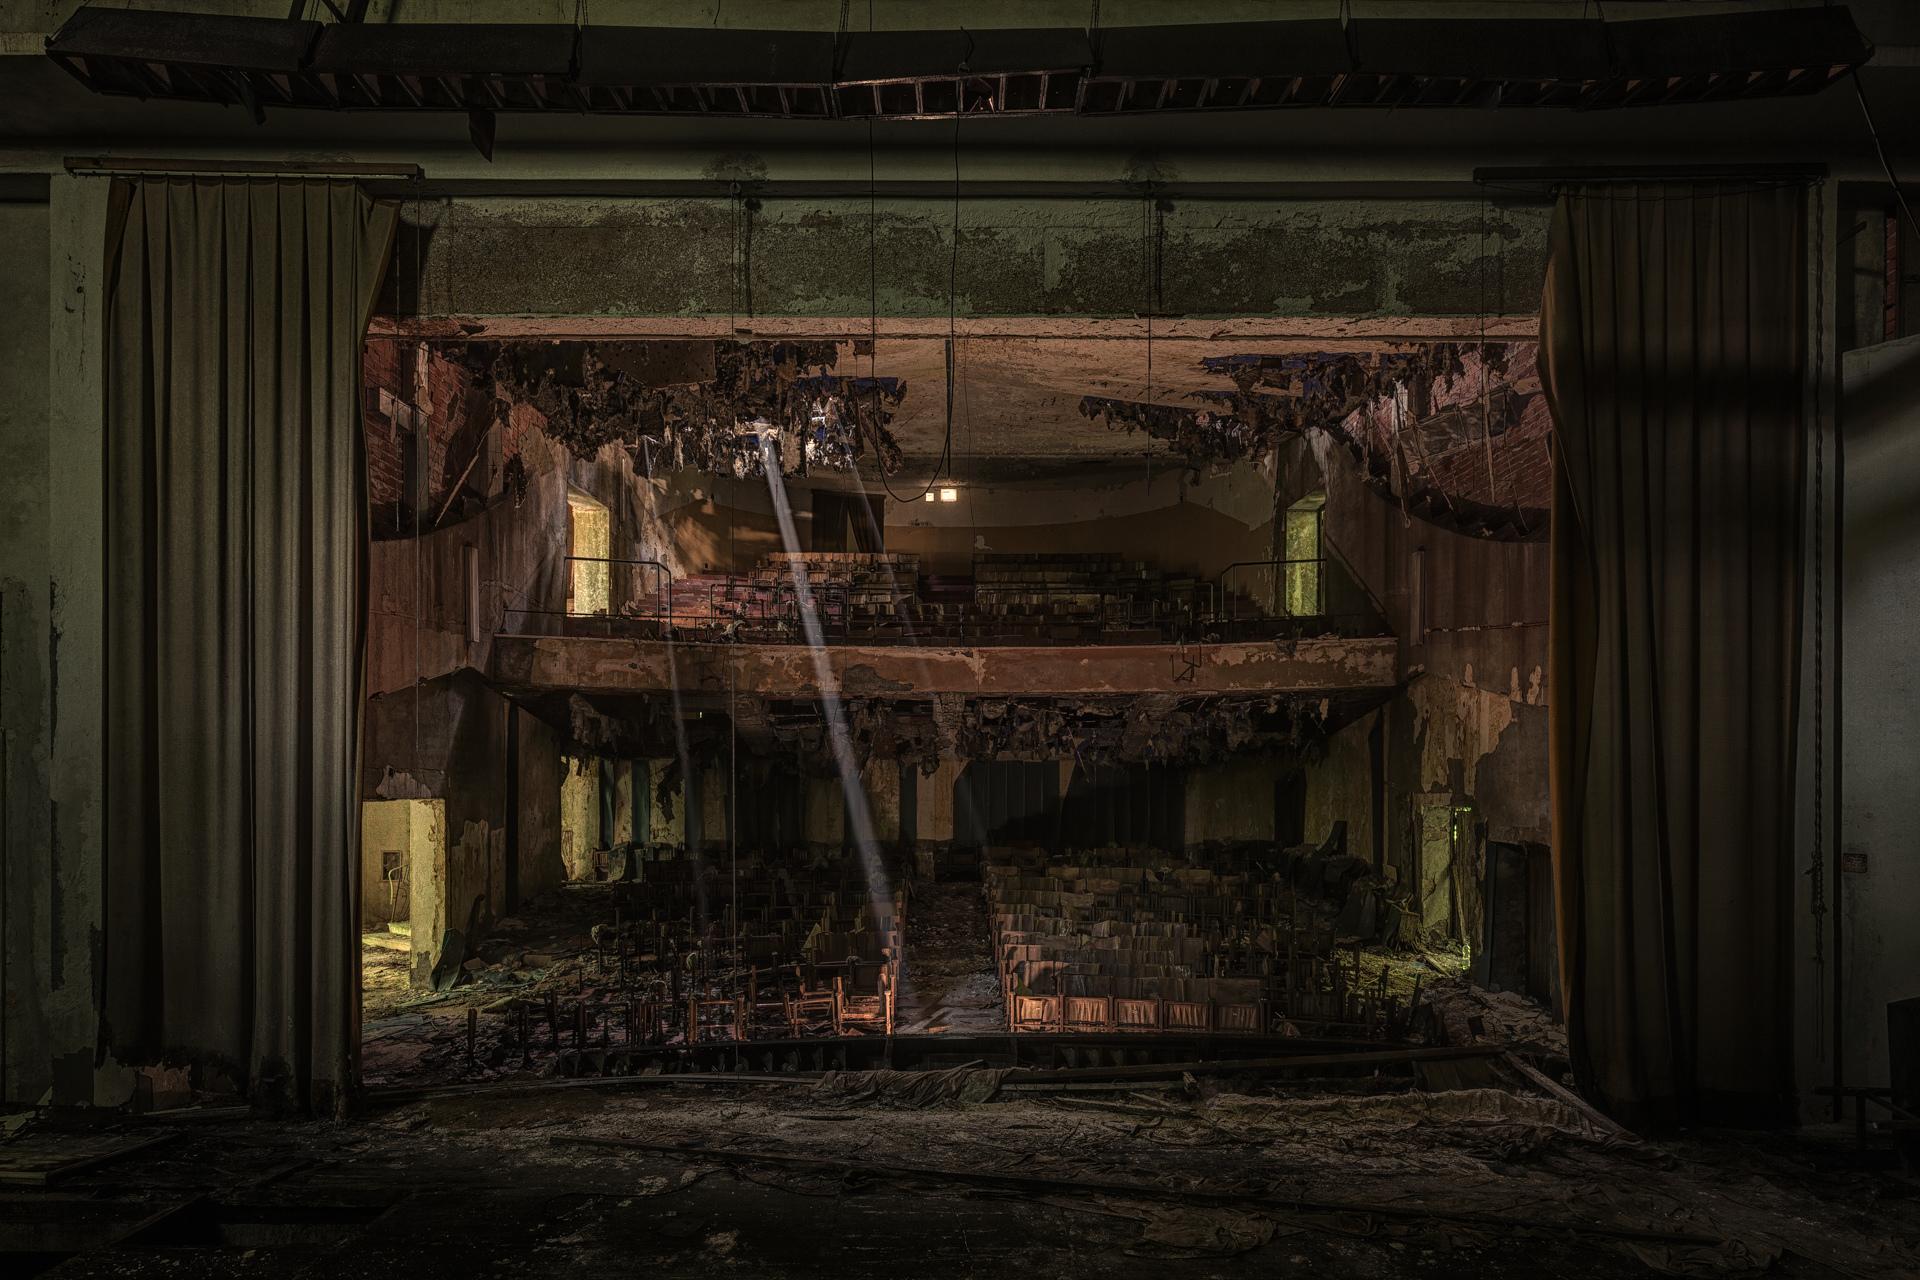 Urban Exploration - Manicomio Vendetta - Final Curtain